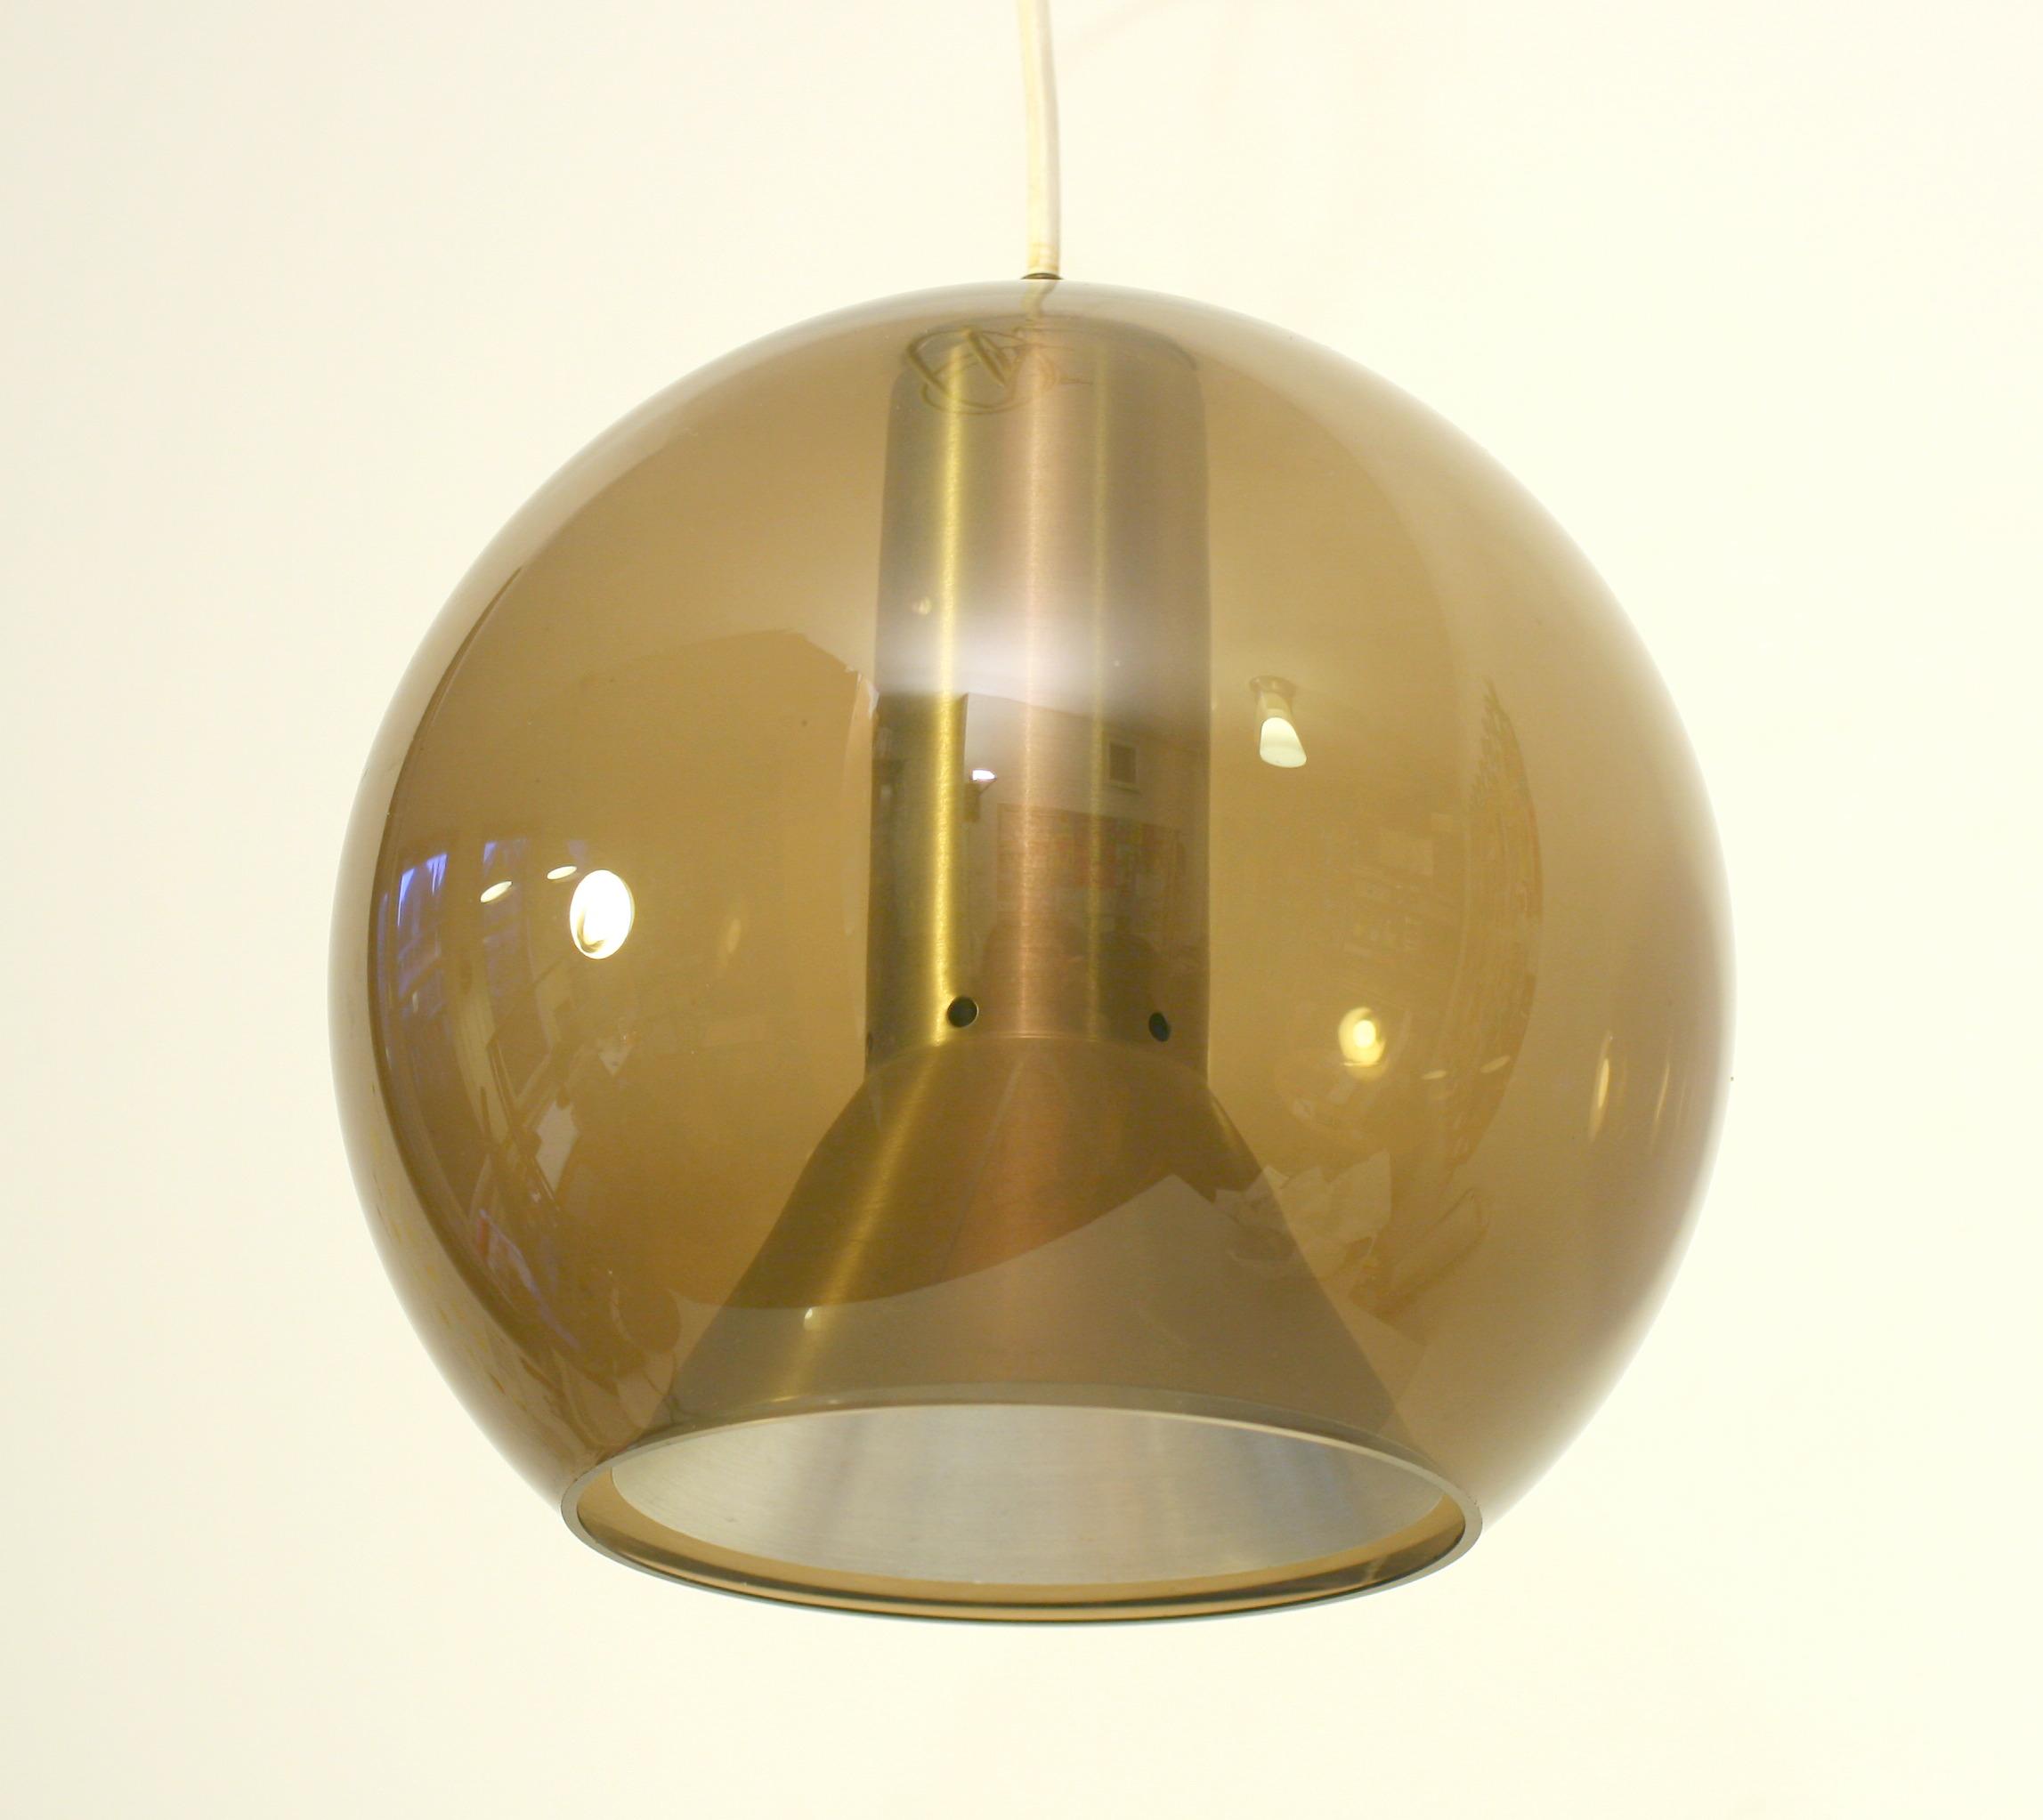 globe lamps photo - 6